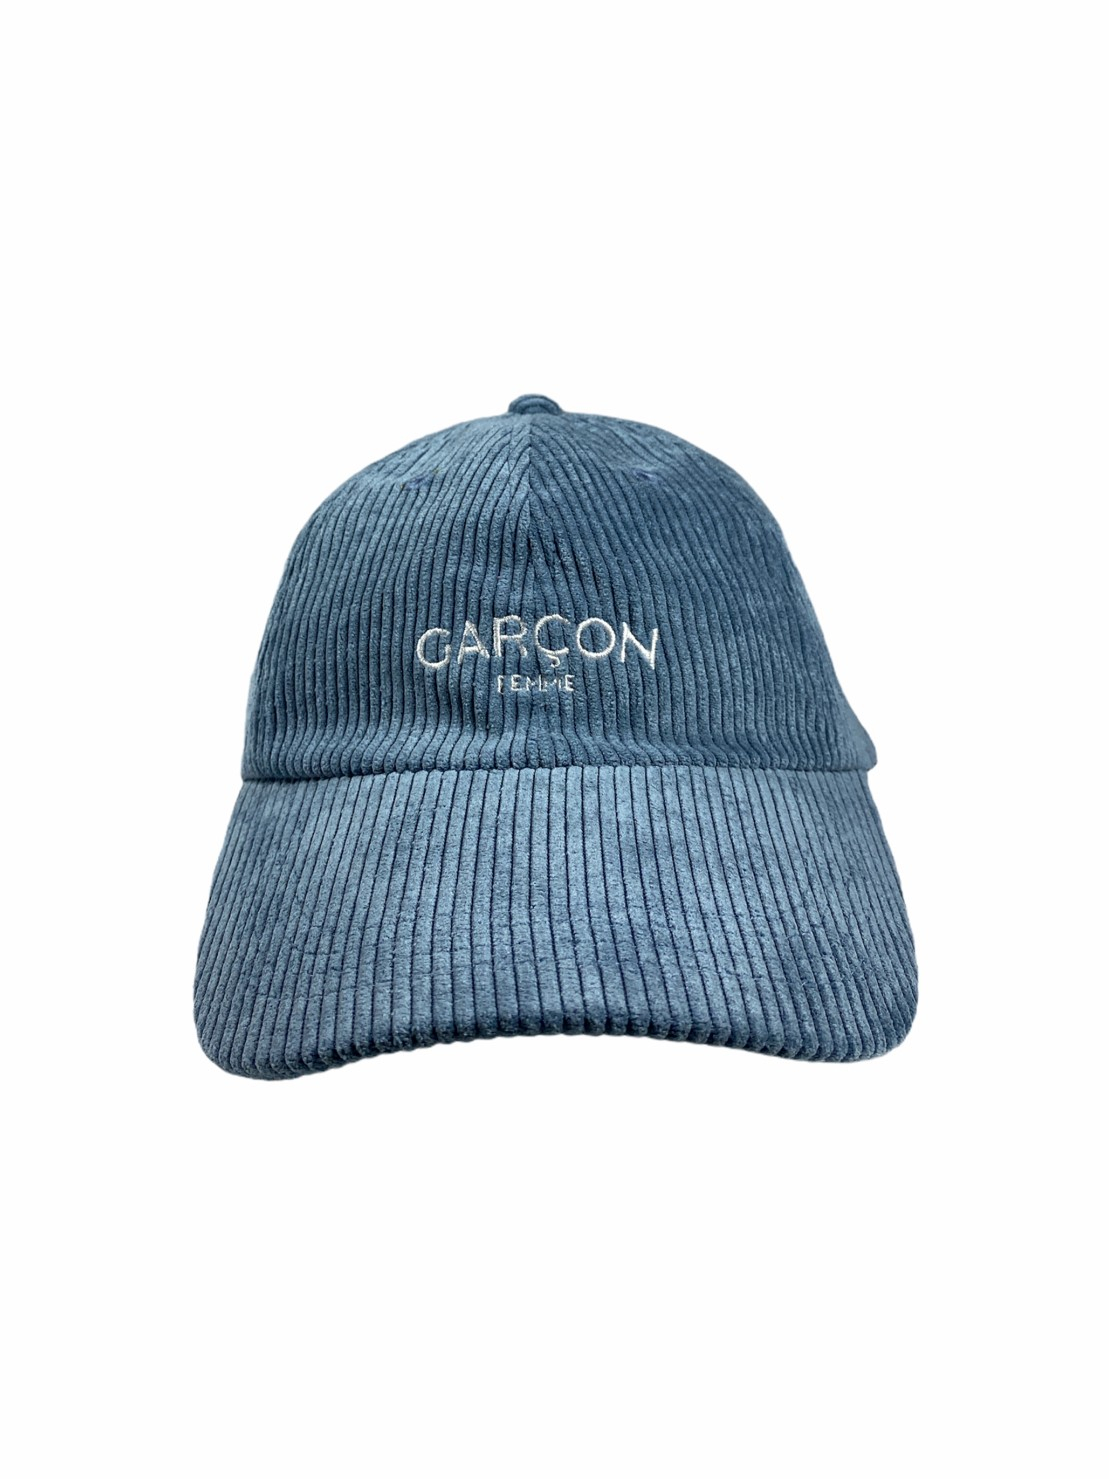 Garcon Cap - Femme (Ocean Blue)